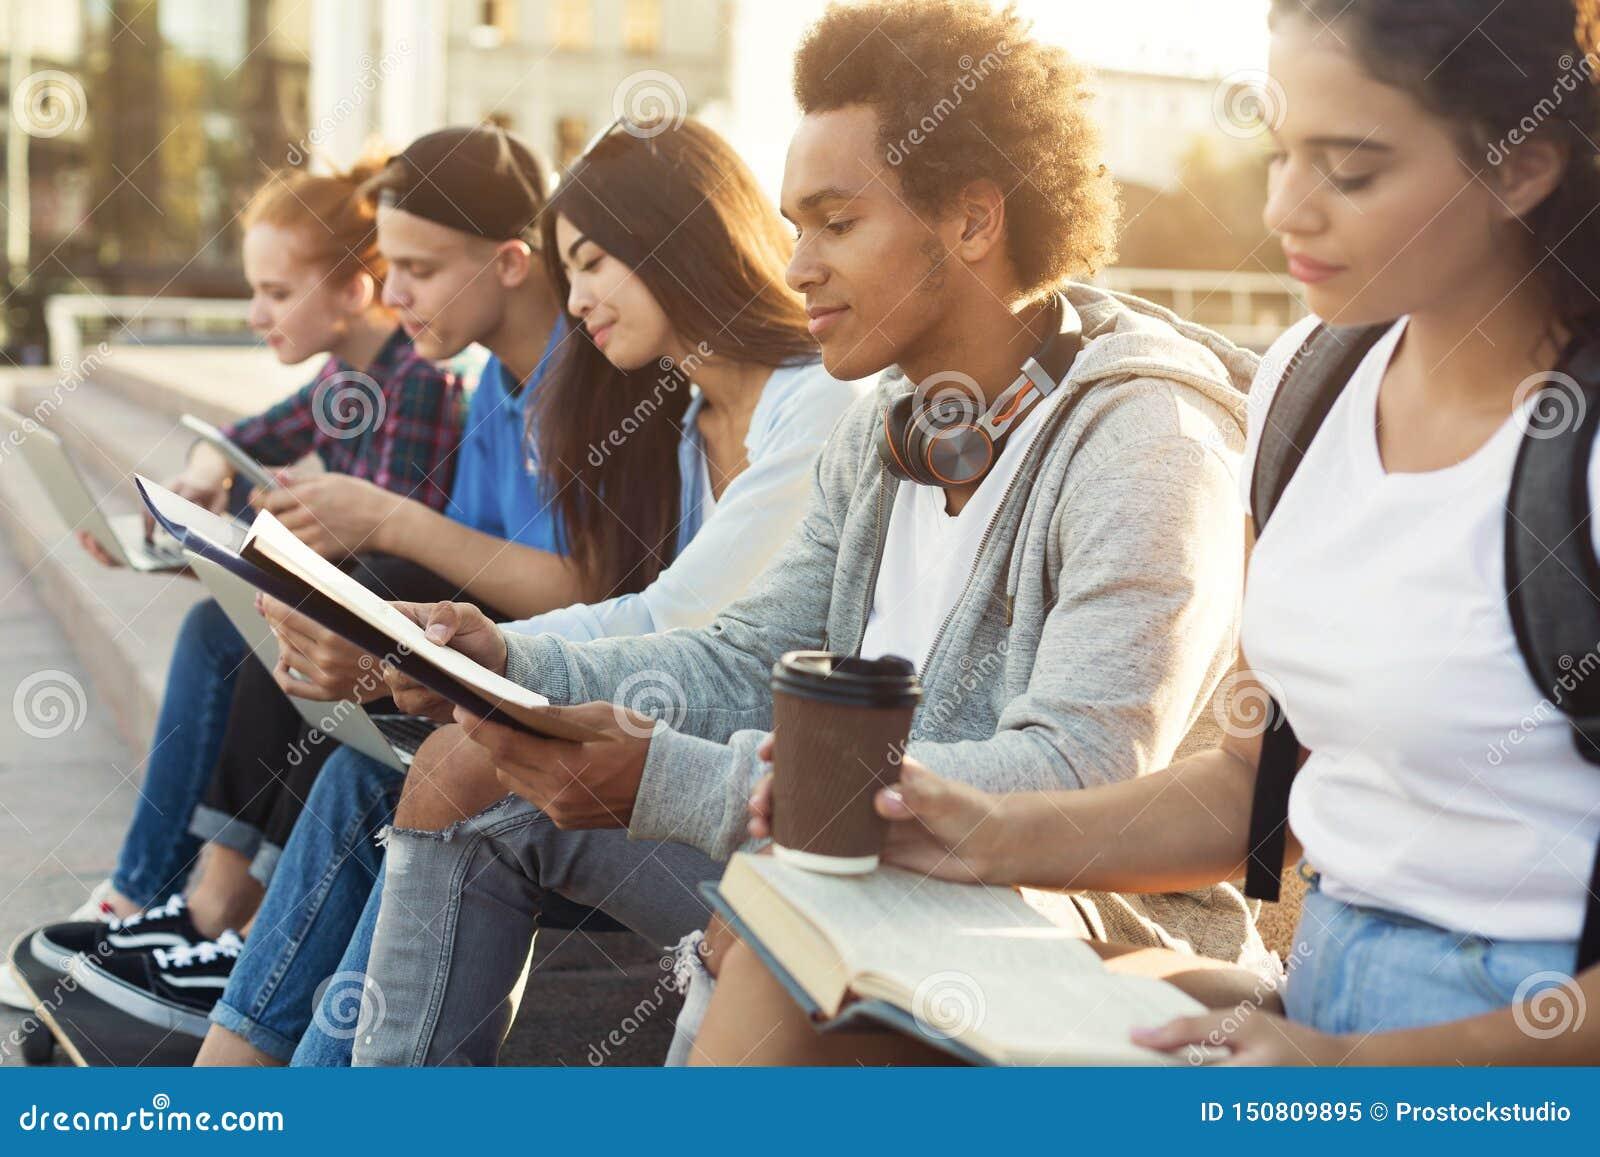 Tiener Diverse Studenten die in openlucht in Avond bestuderen